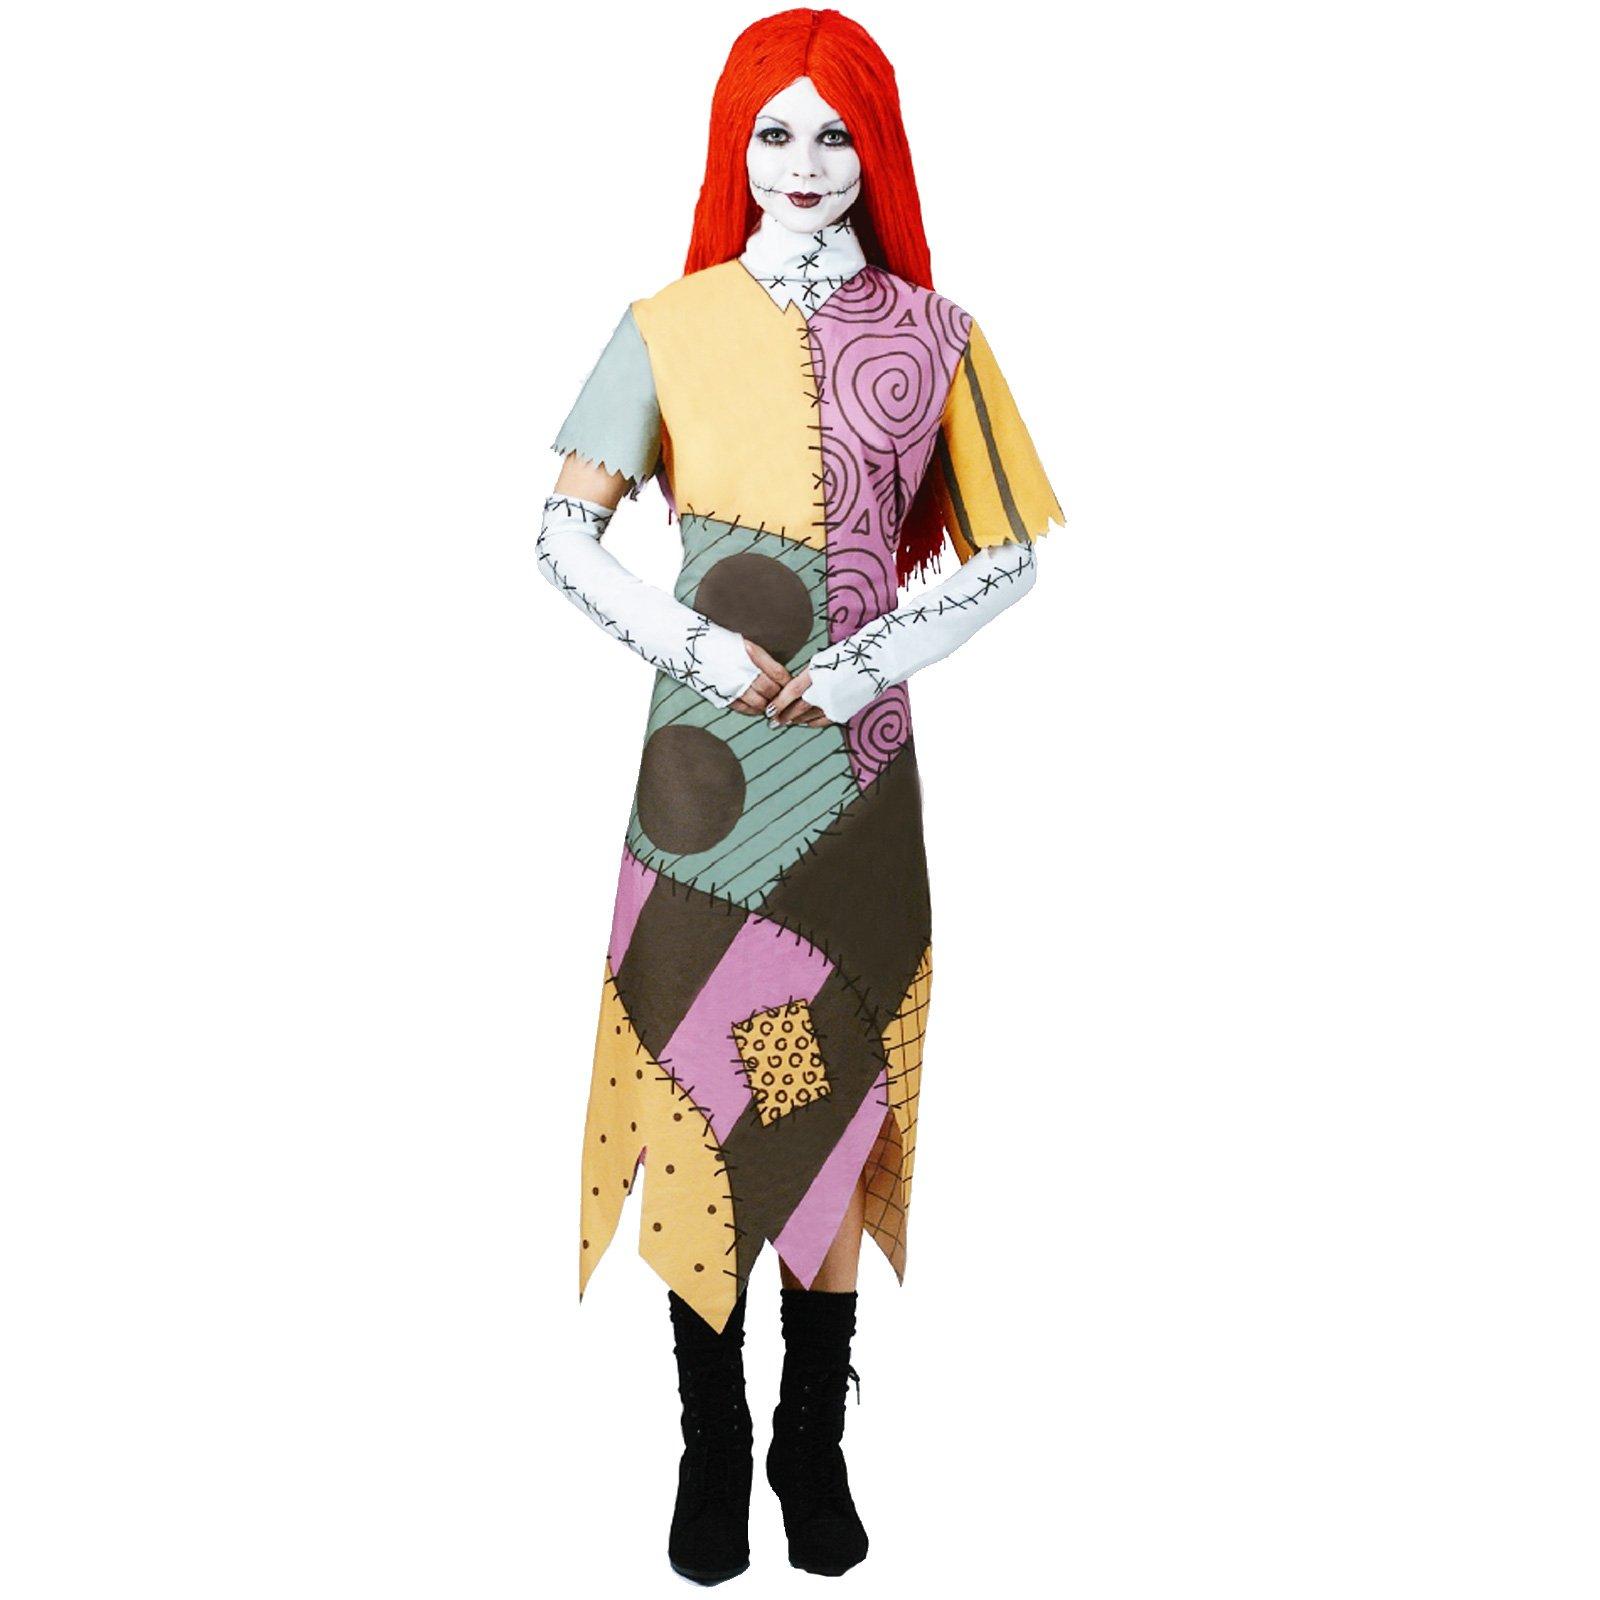 Nightmare Christmas Sally Dress Clipart.